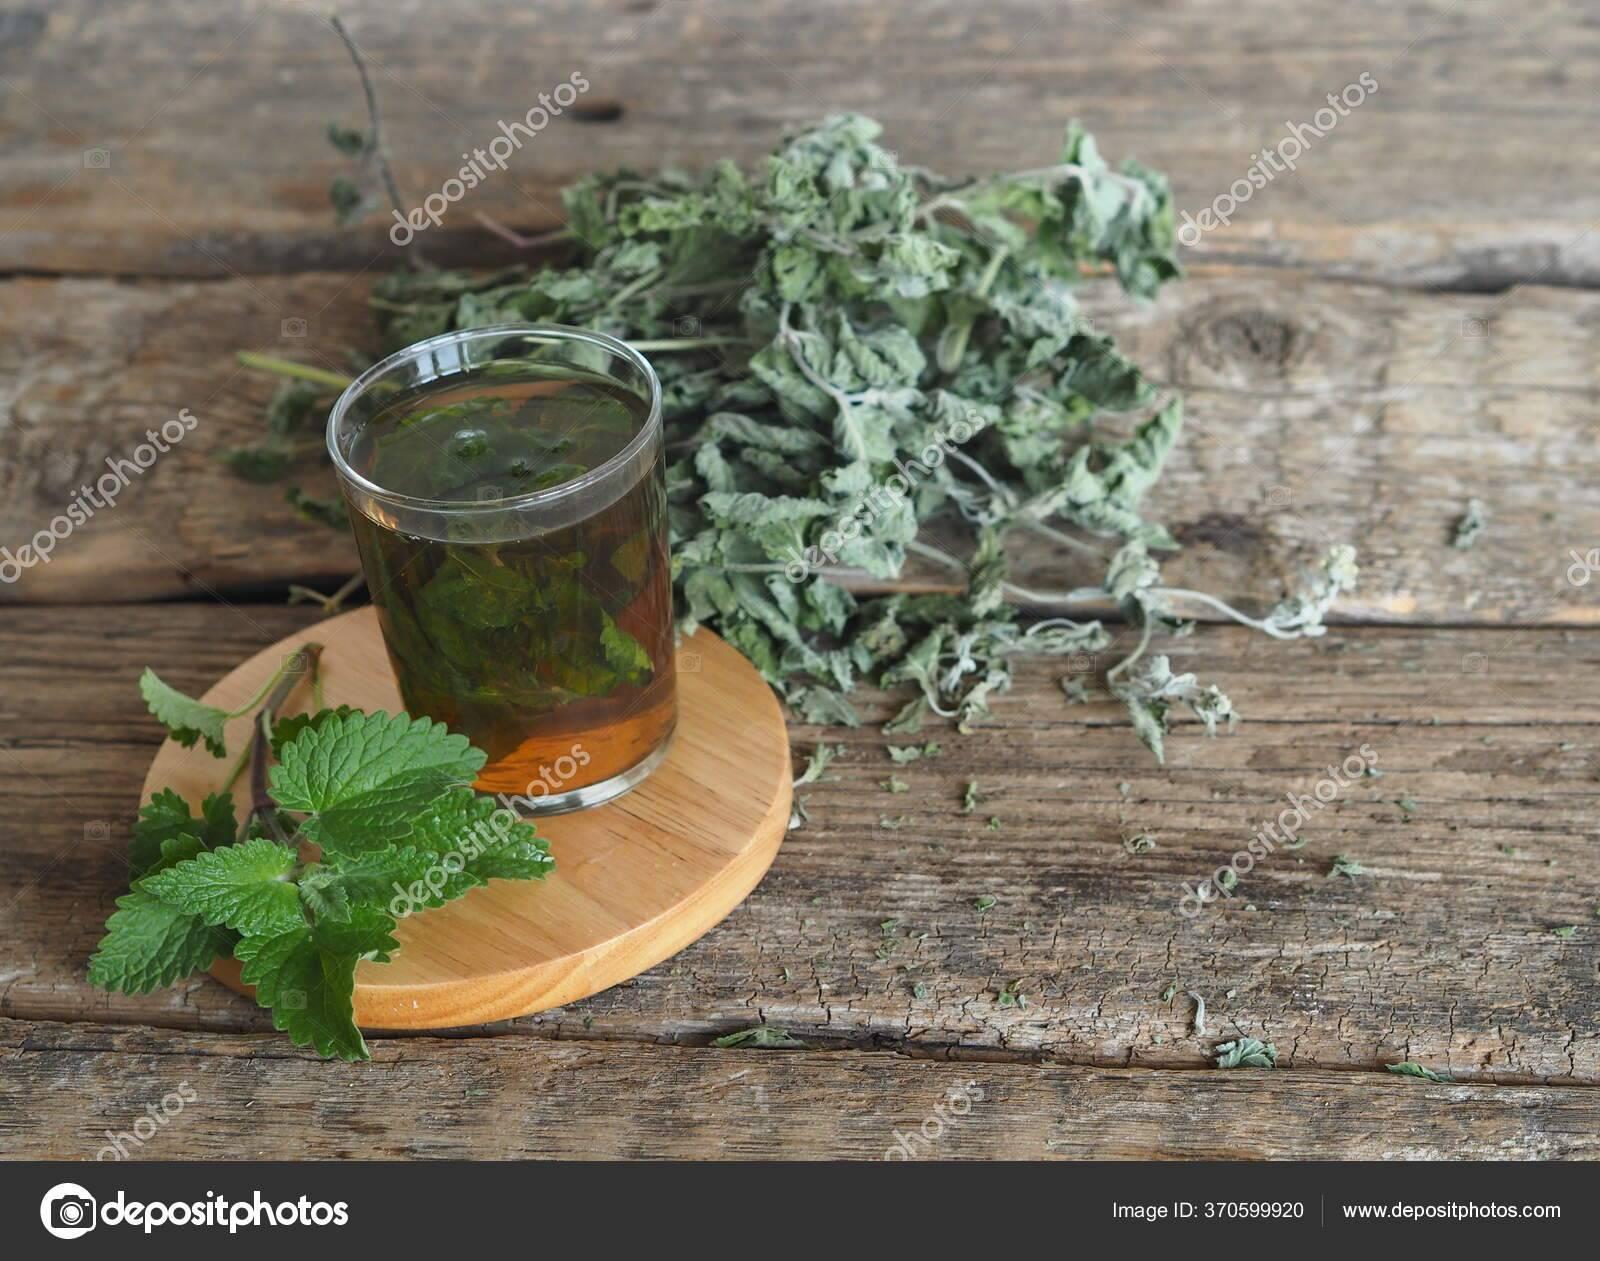 Лимонно мятная настойка на самогоне. рецепт приготовления настойки на мяте на водке (спирту, самогоне)